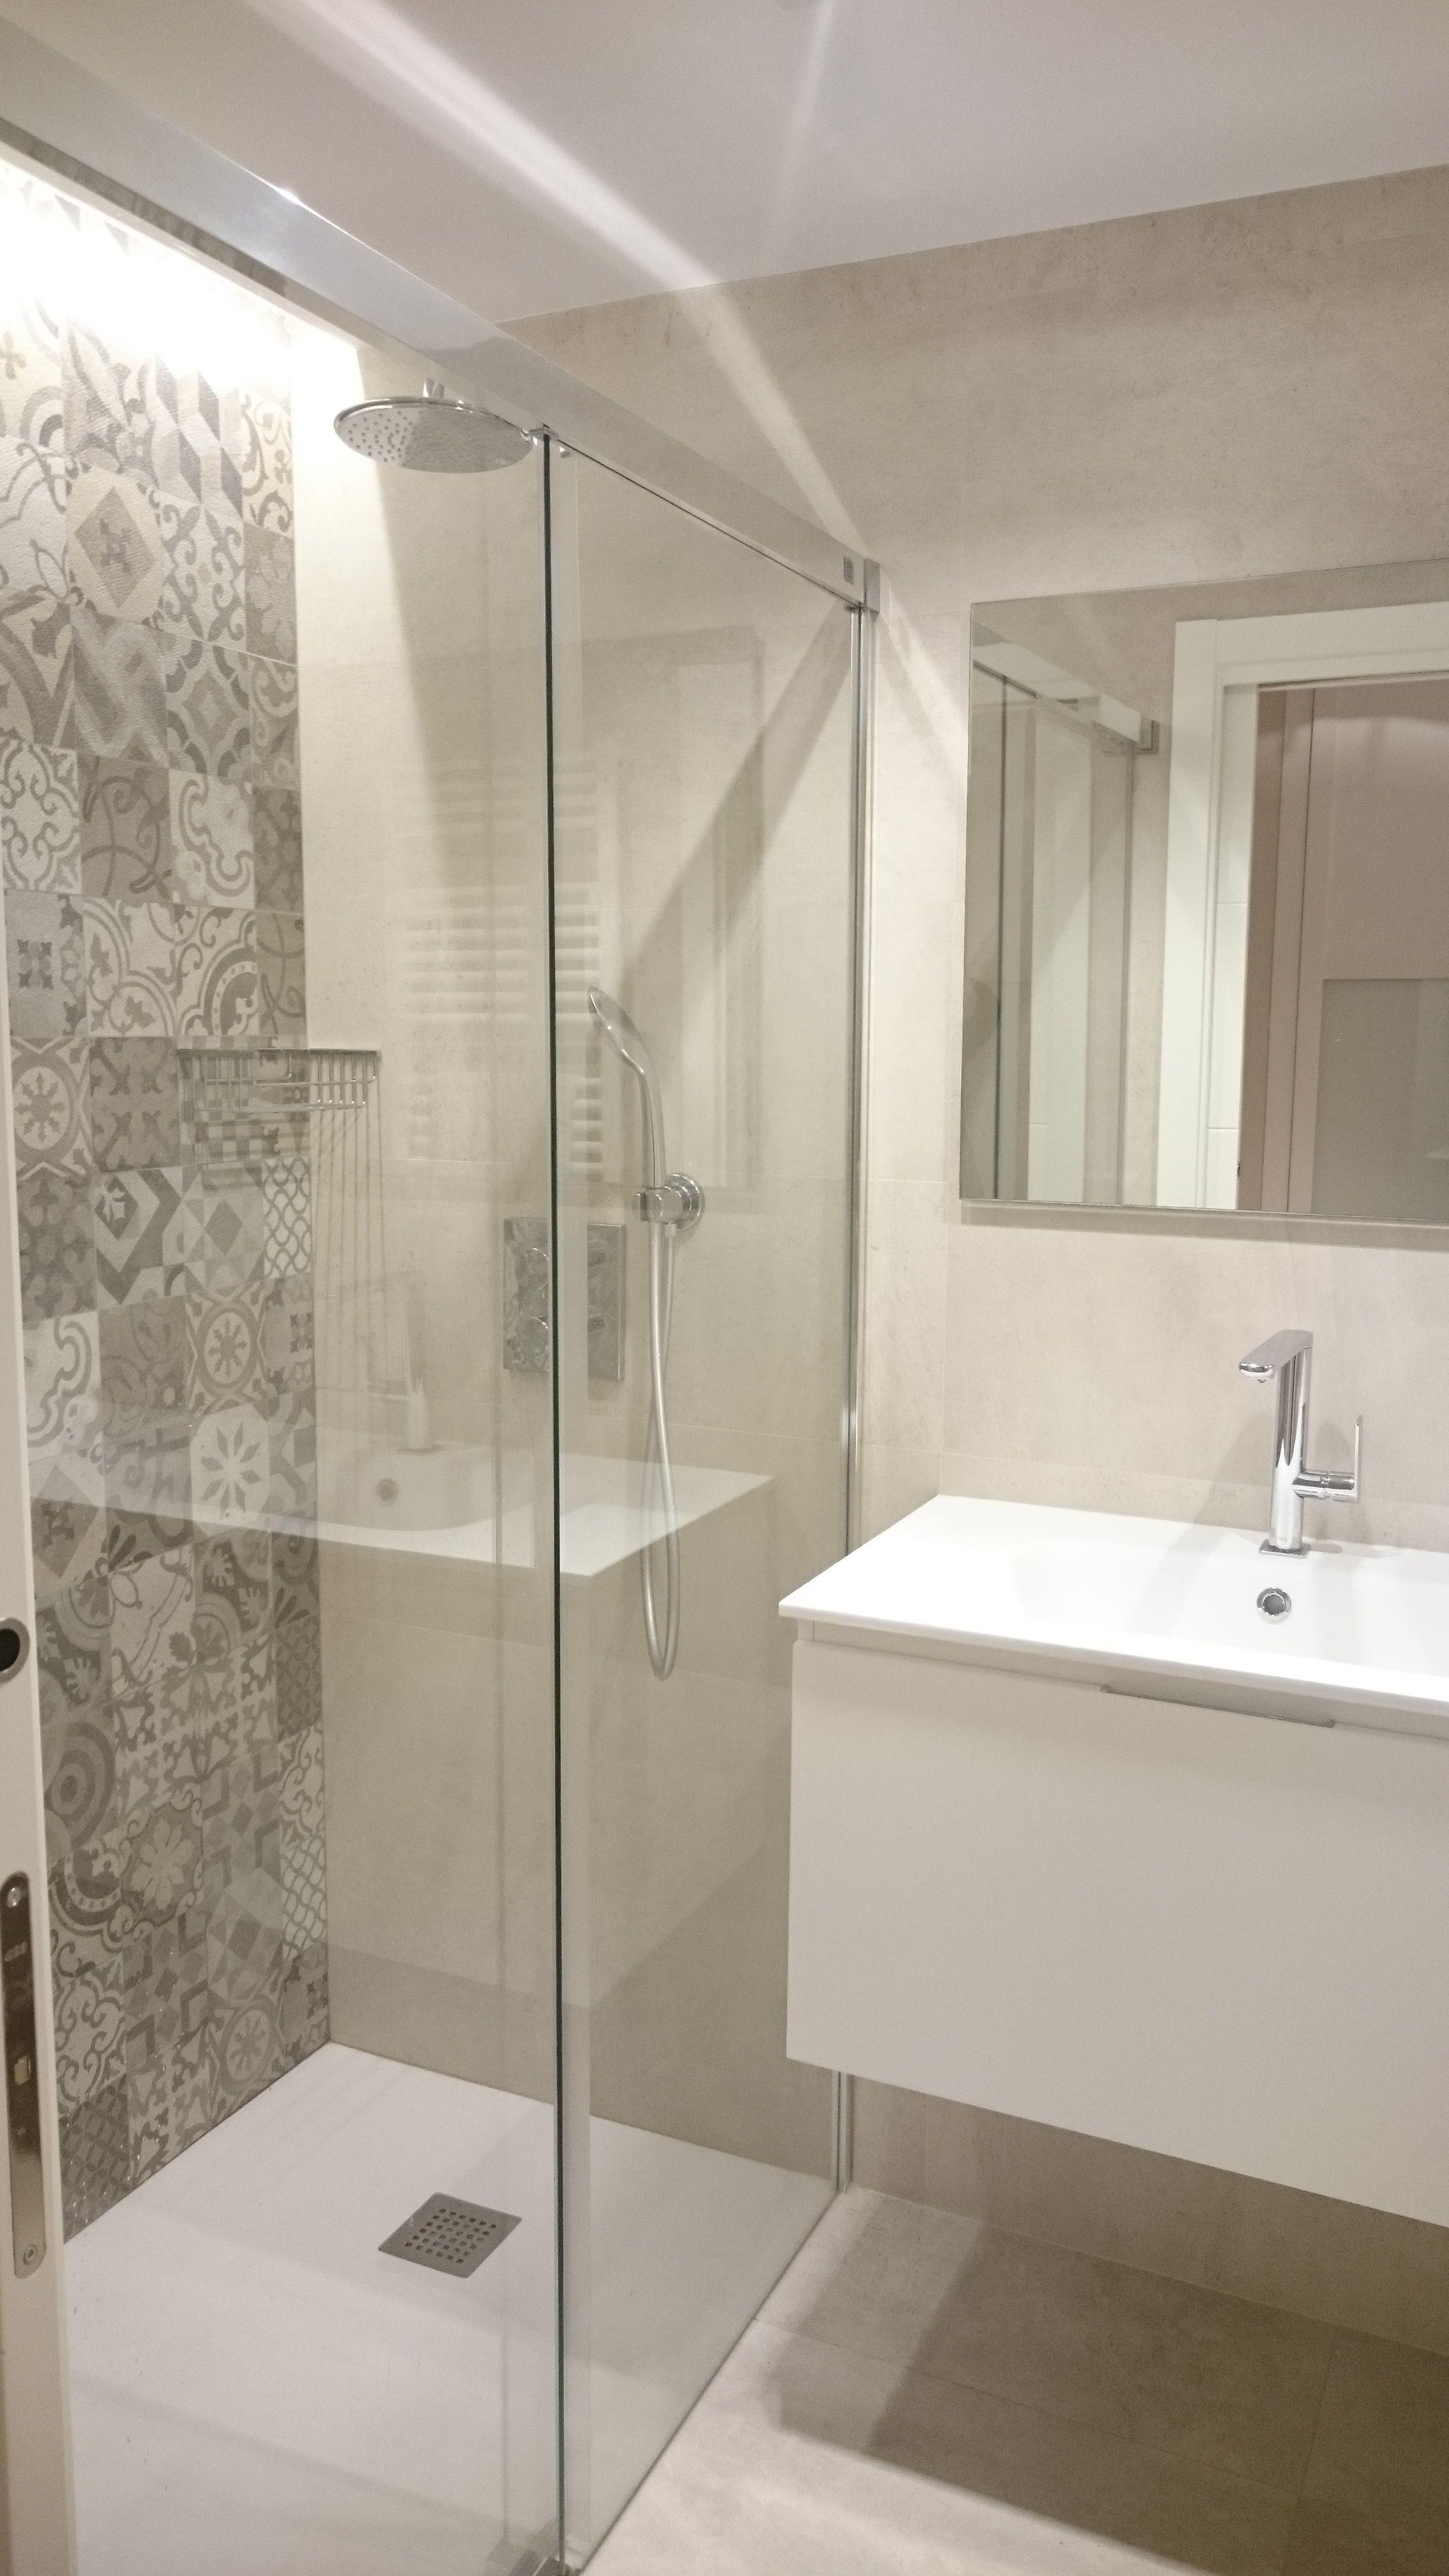 Azulejo y ducha cuarto de ba o cuarto de ba o ba os for Fotos de cuartos de bano con ducha modernos